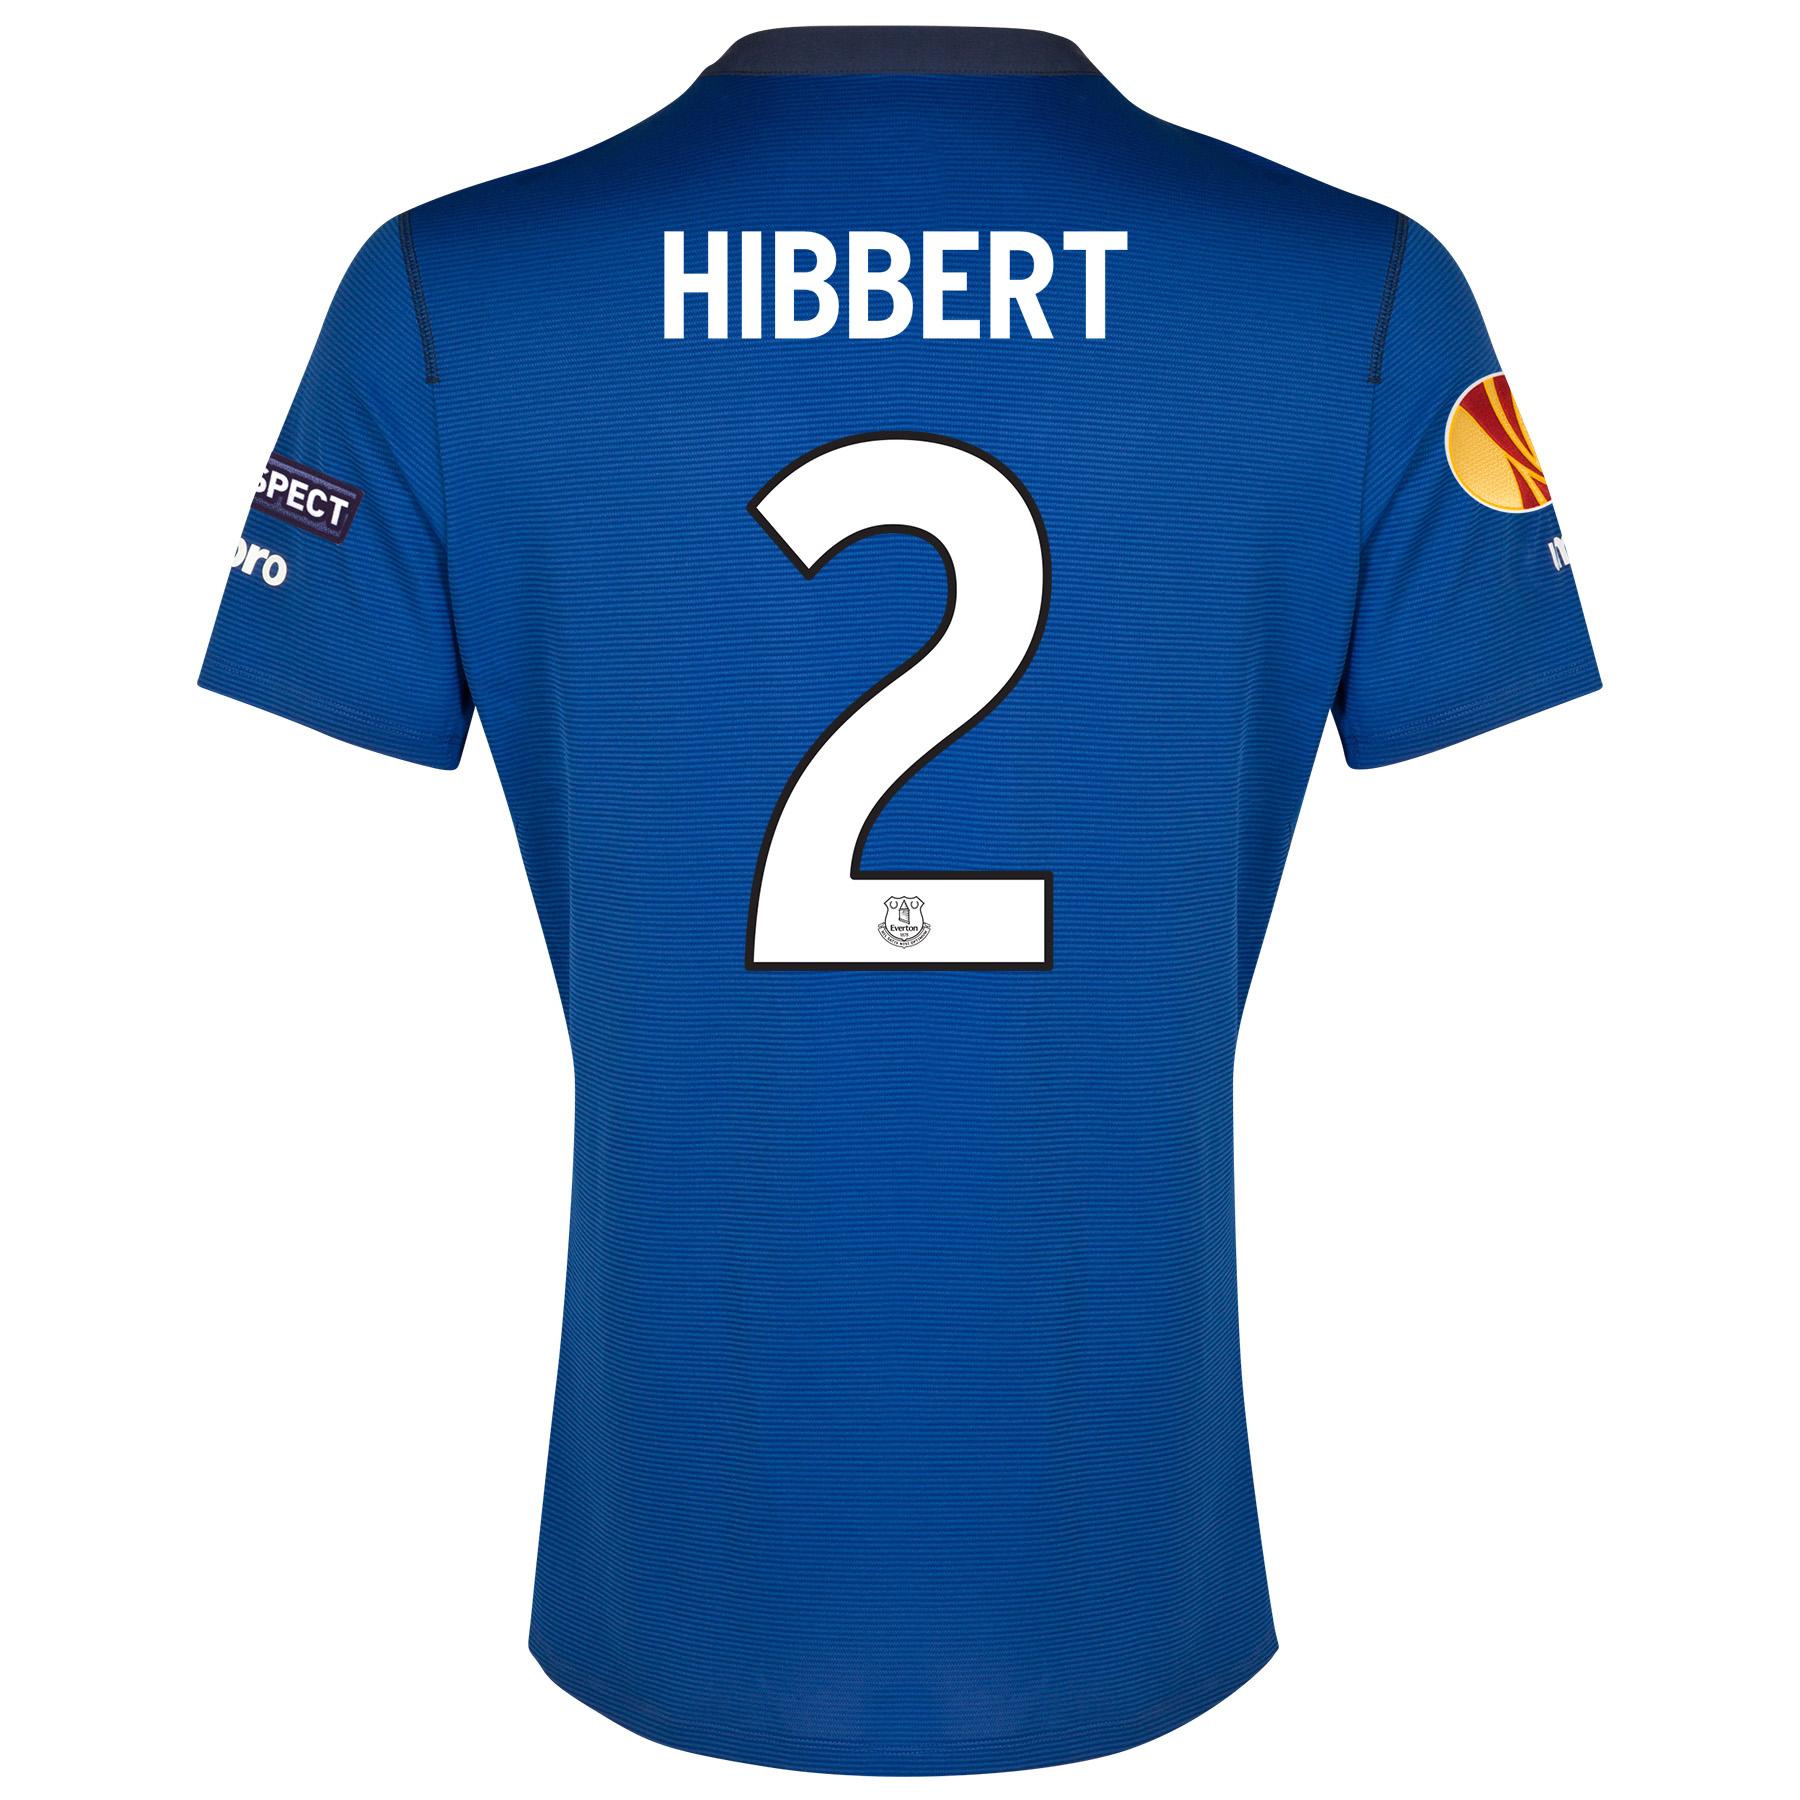 Everton UEFA Europa League Home Shirt 2014/15 SS - Junior with Hibbert 2 printing